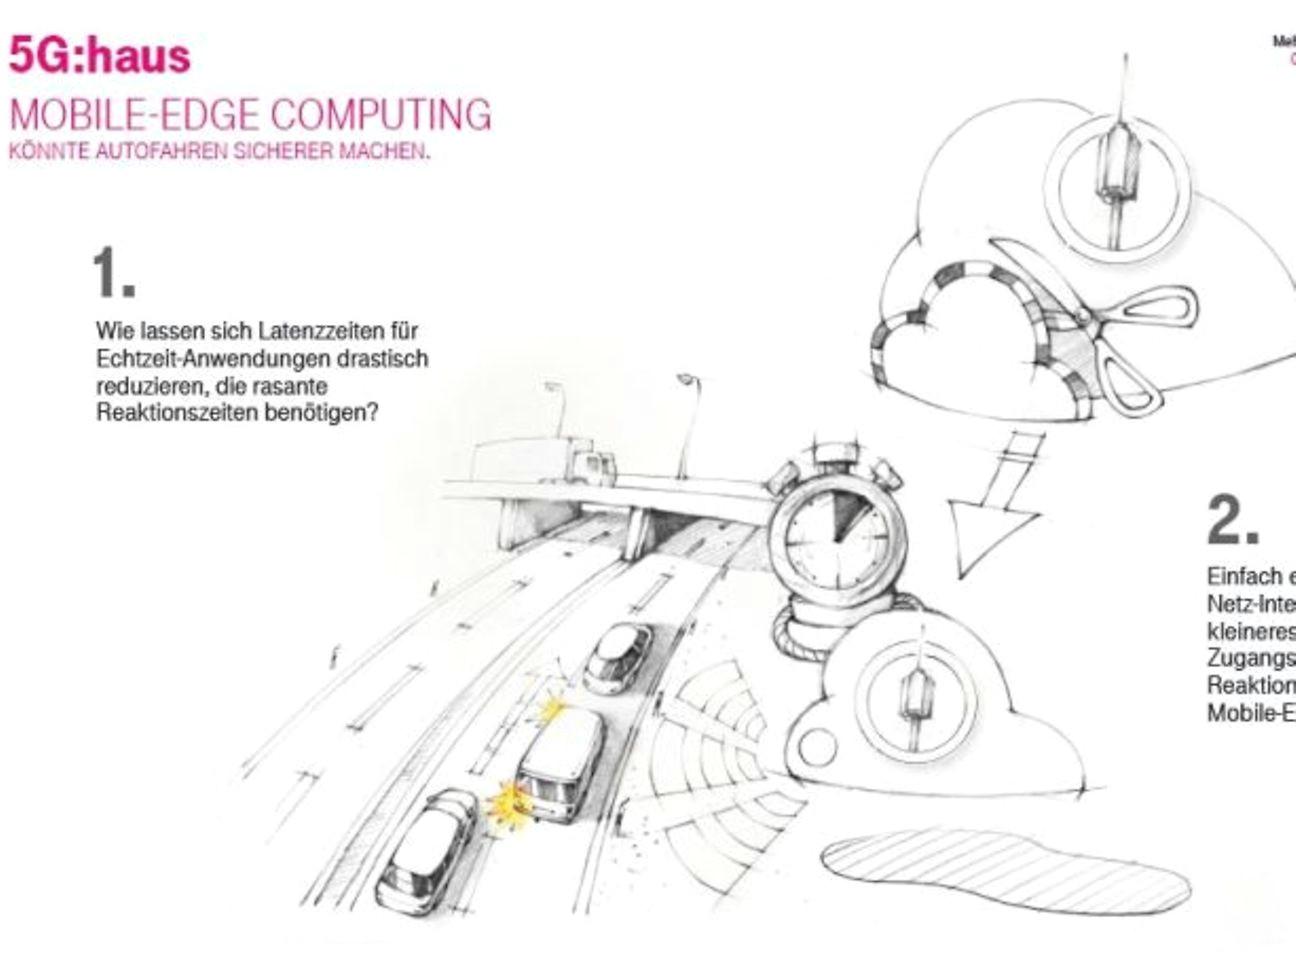 grafik zu cloud selbstfahrende autos